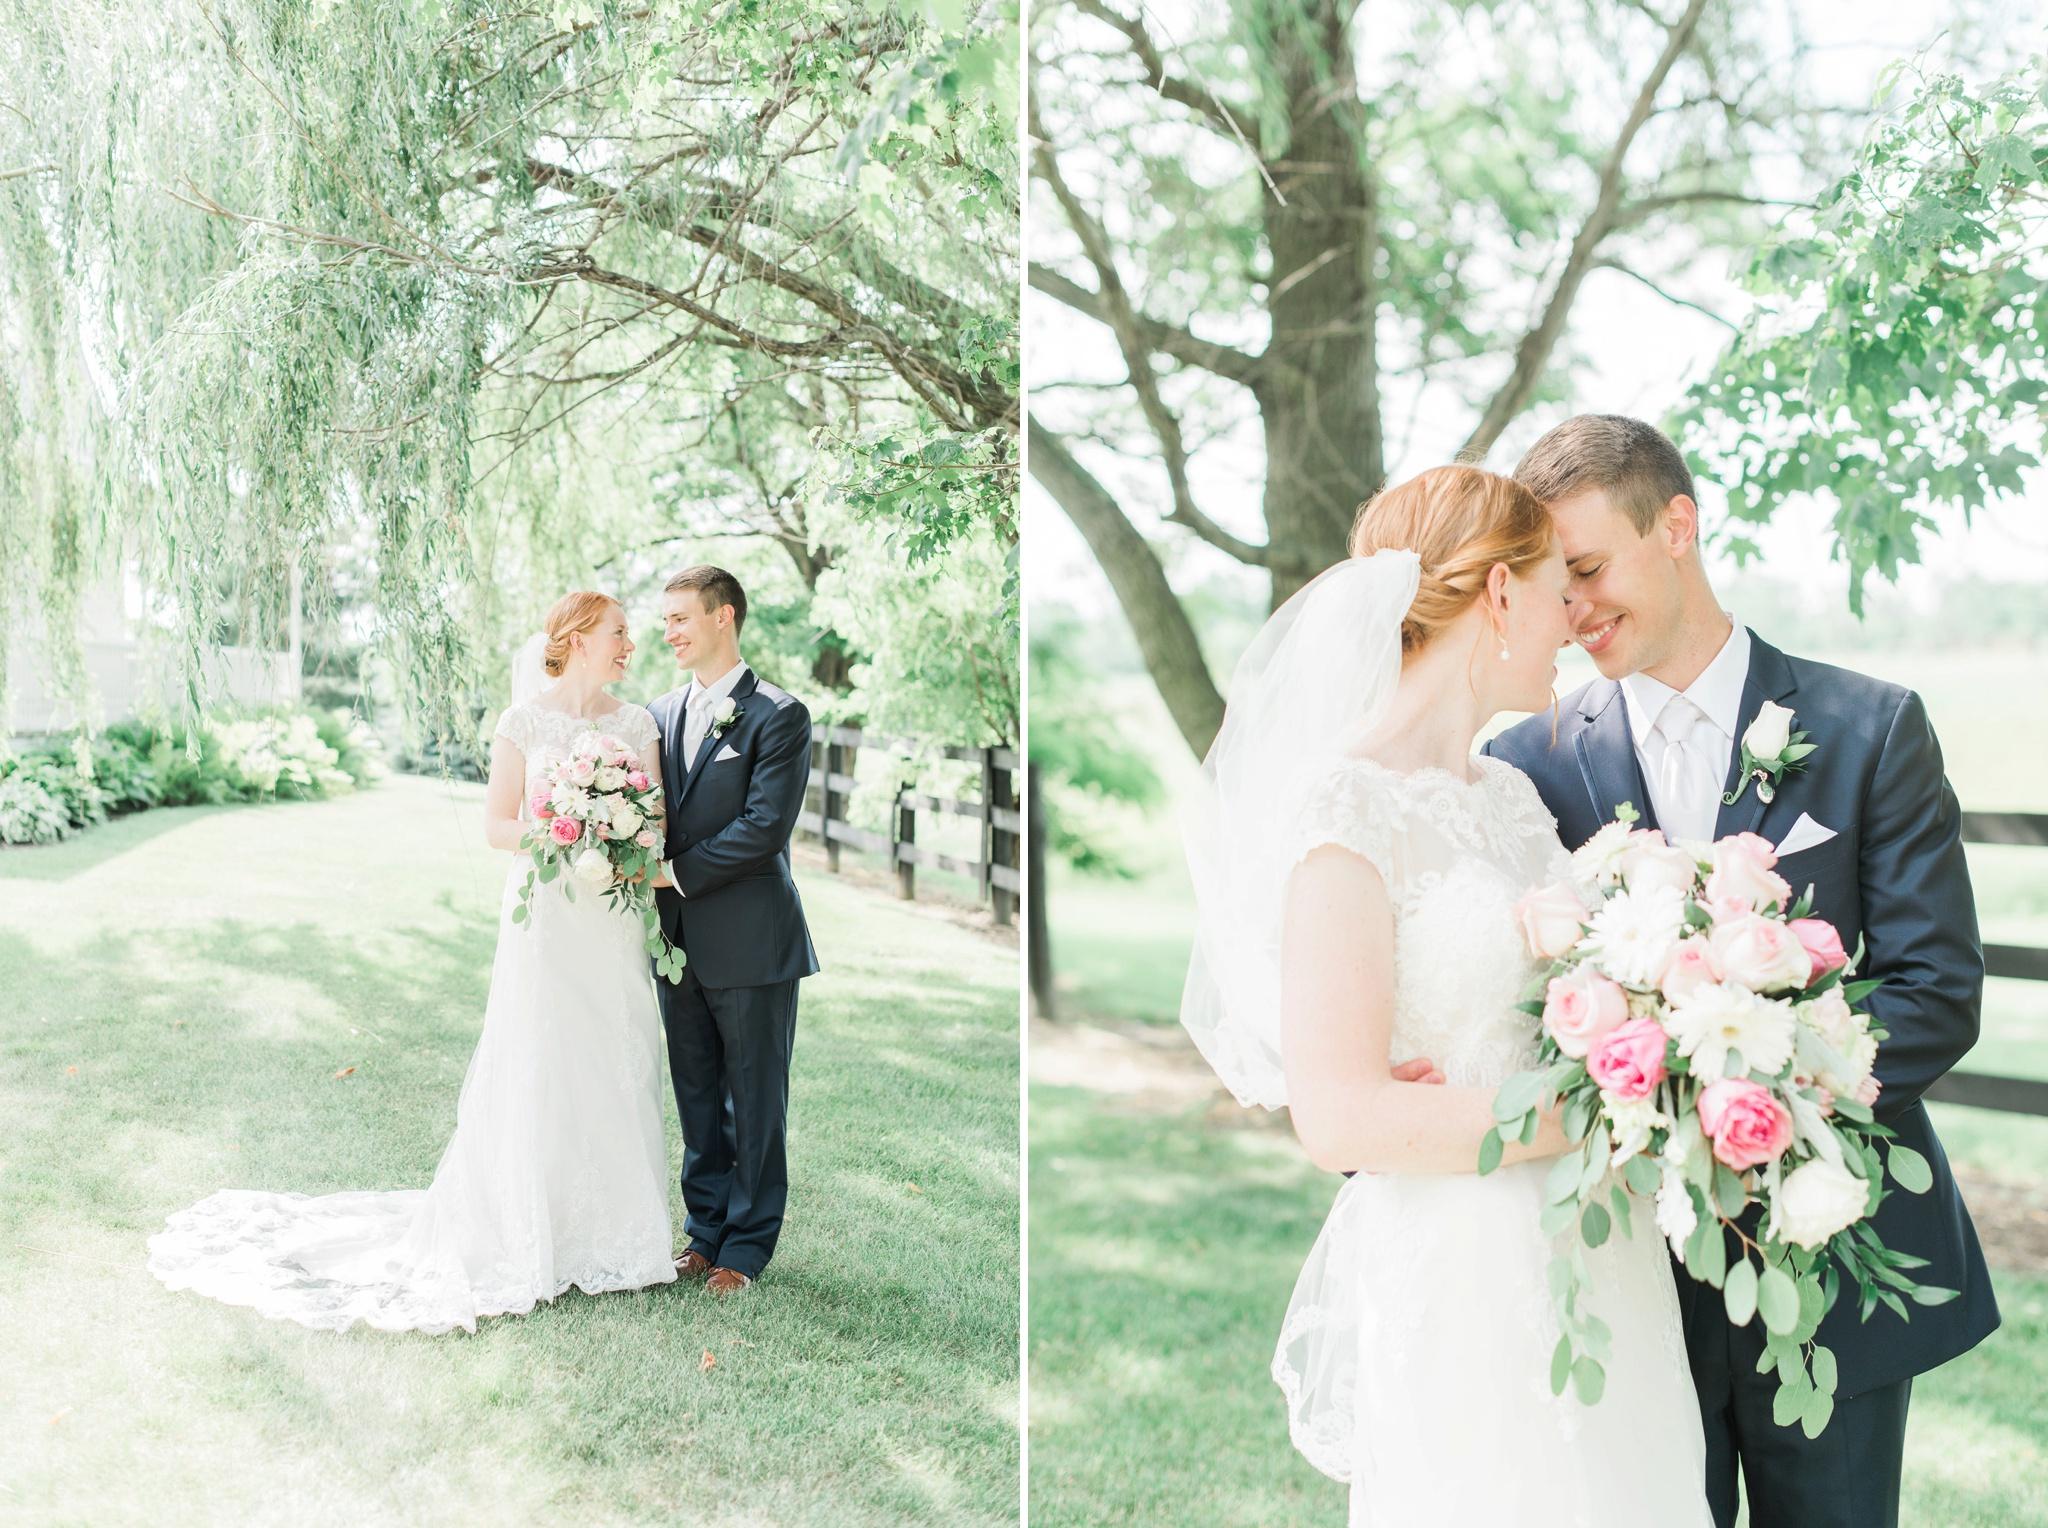 sunbury-ohio-wedding-hannah-johnathan_0090.jpg